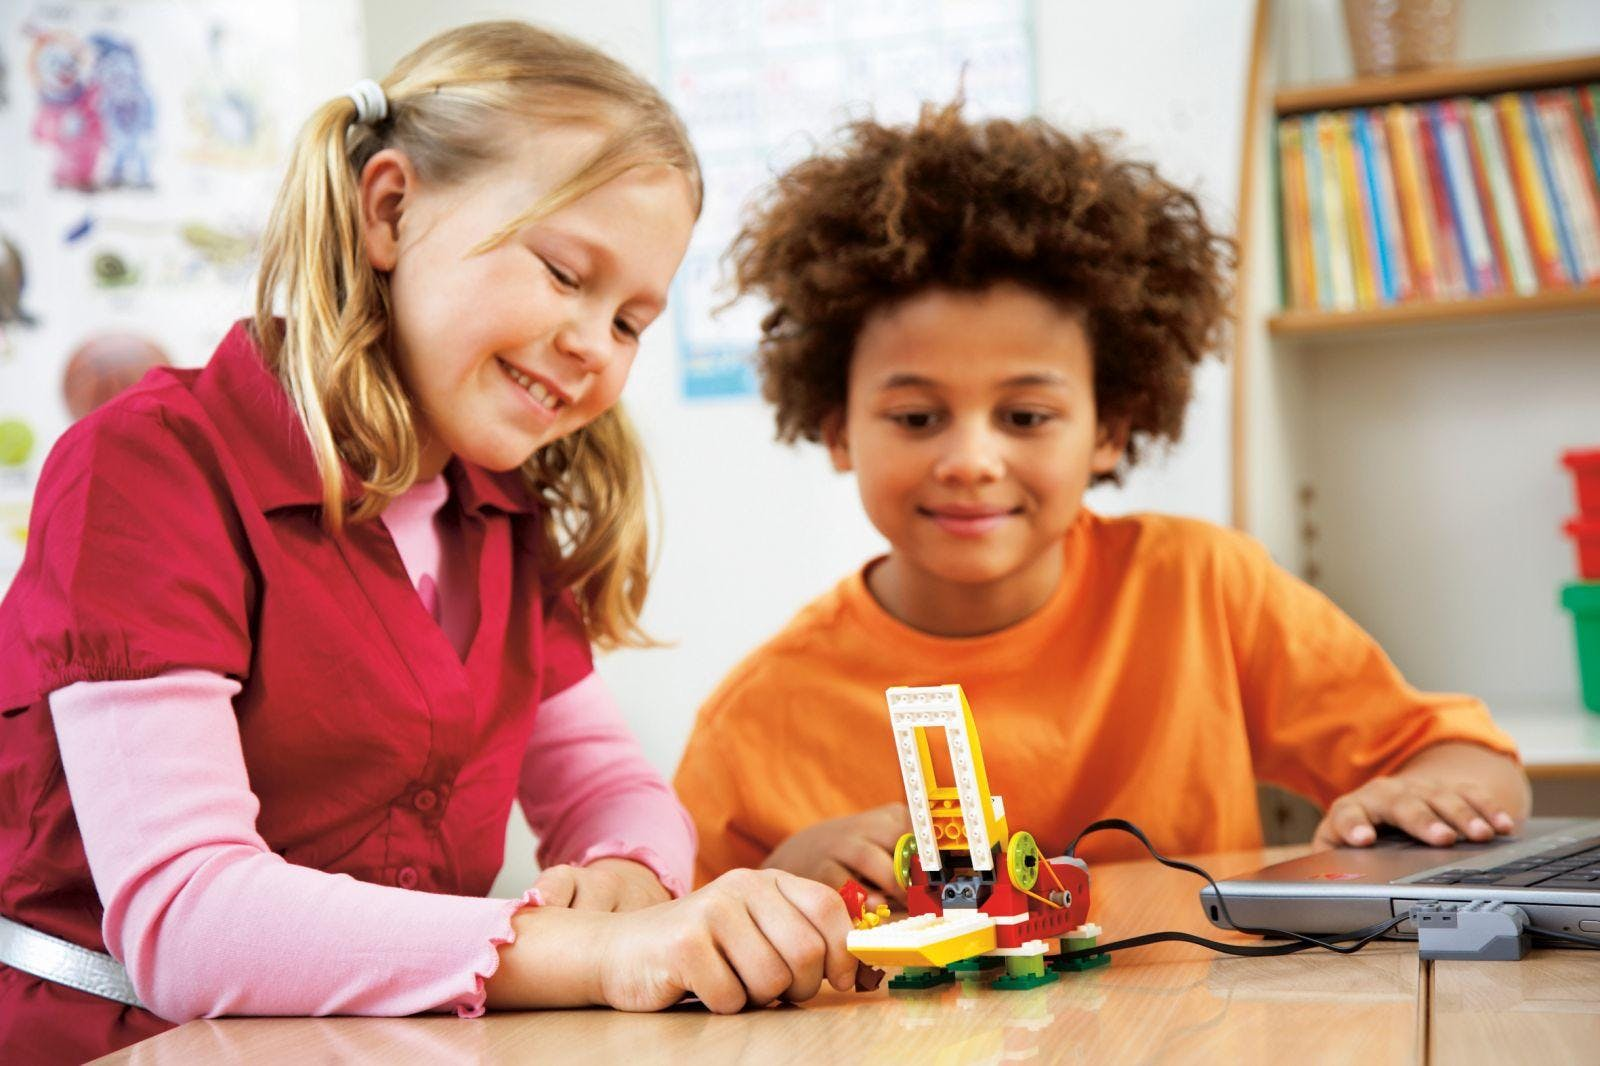 25 Off Lego Wedo Robotics Workshop For Kids 4 8 Years At